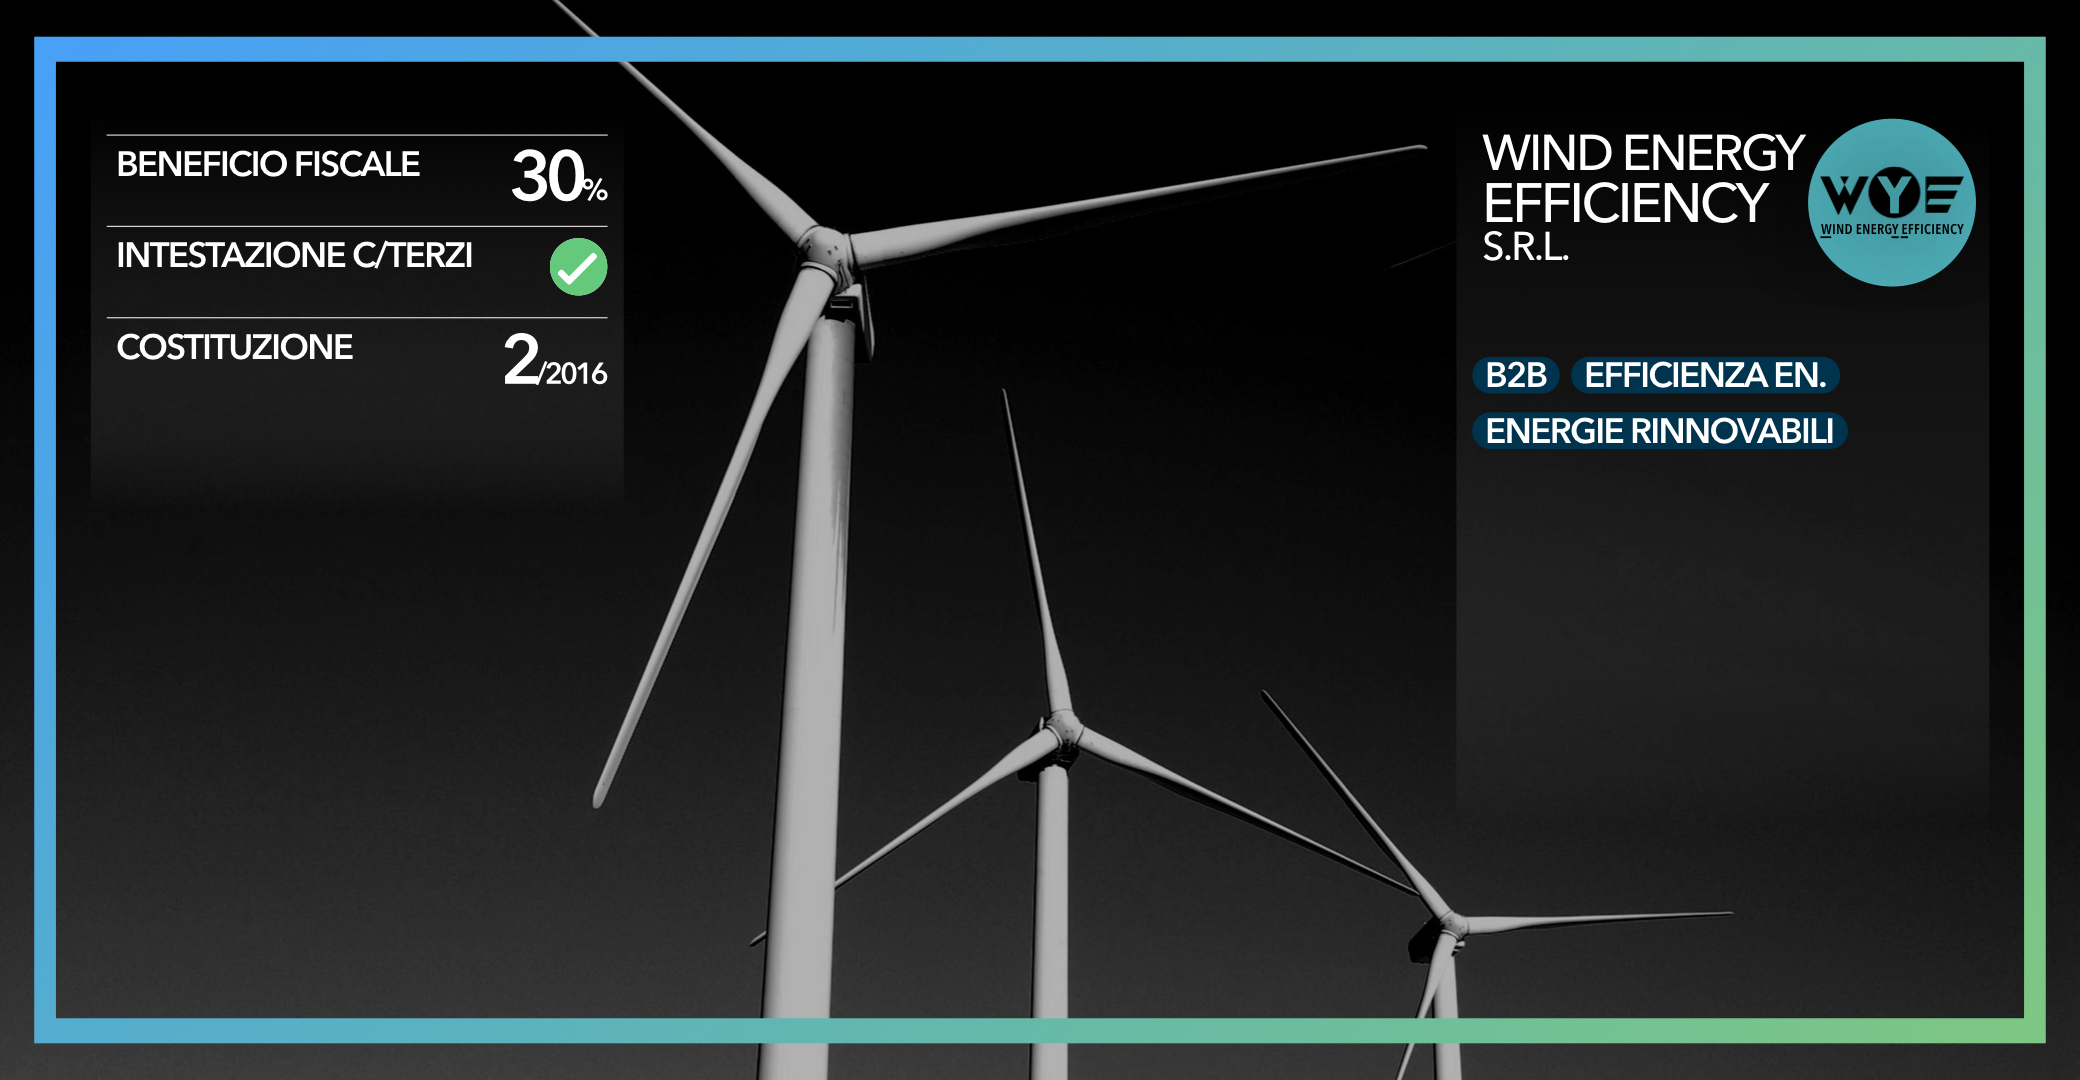 wind-energy-efficiency-eolico-crowdfunding